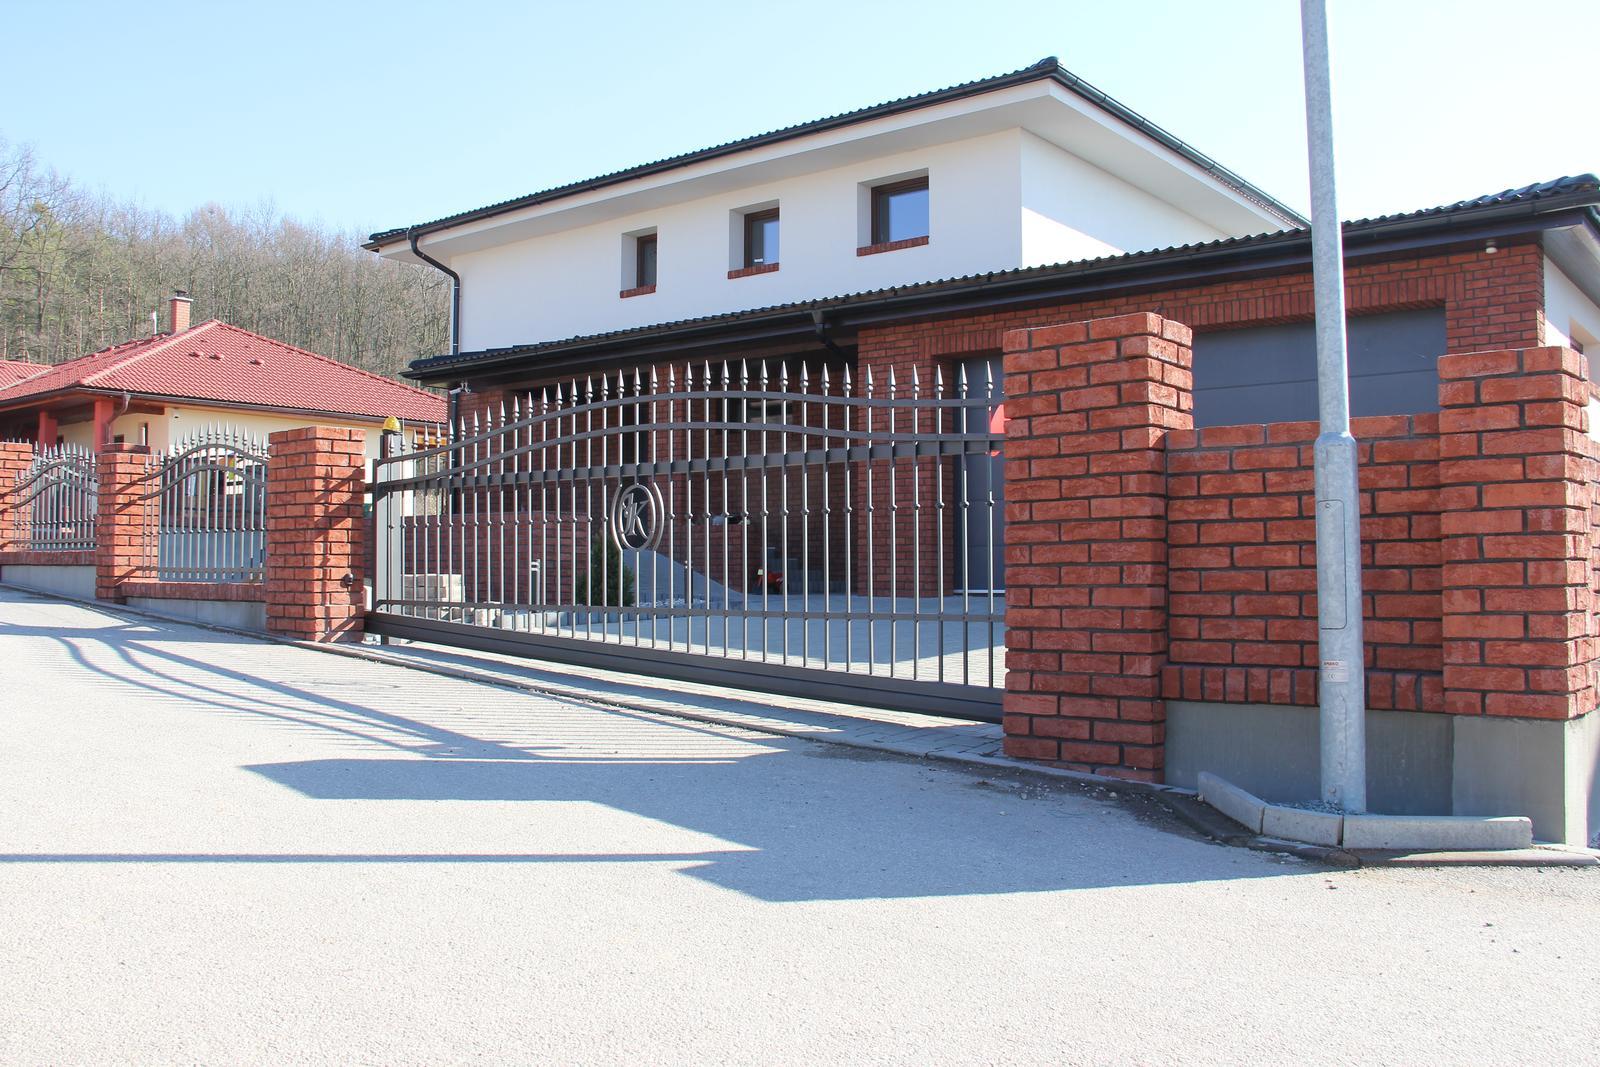 Stavba domu - 23.2.2014 - máme bránu, máme plot